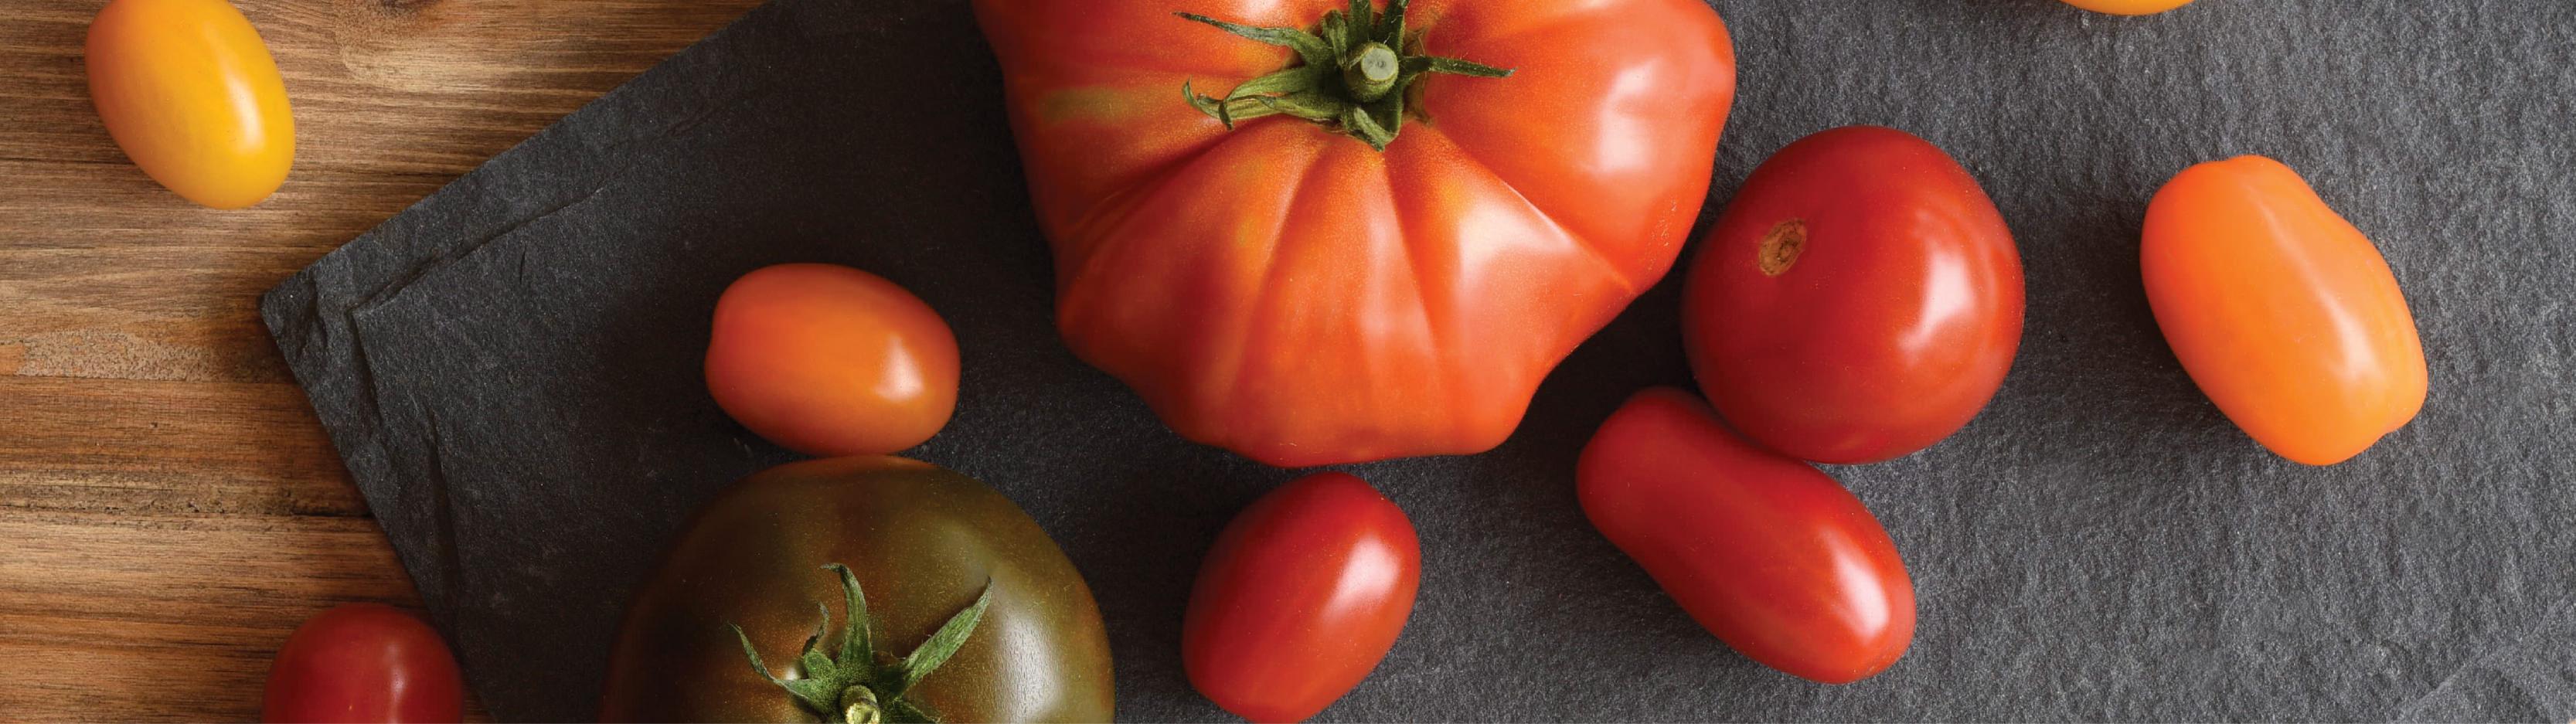 exquisite heirloom® tomatoes